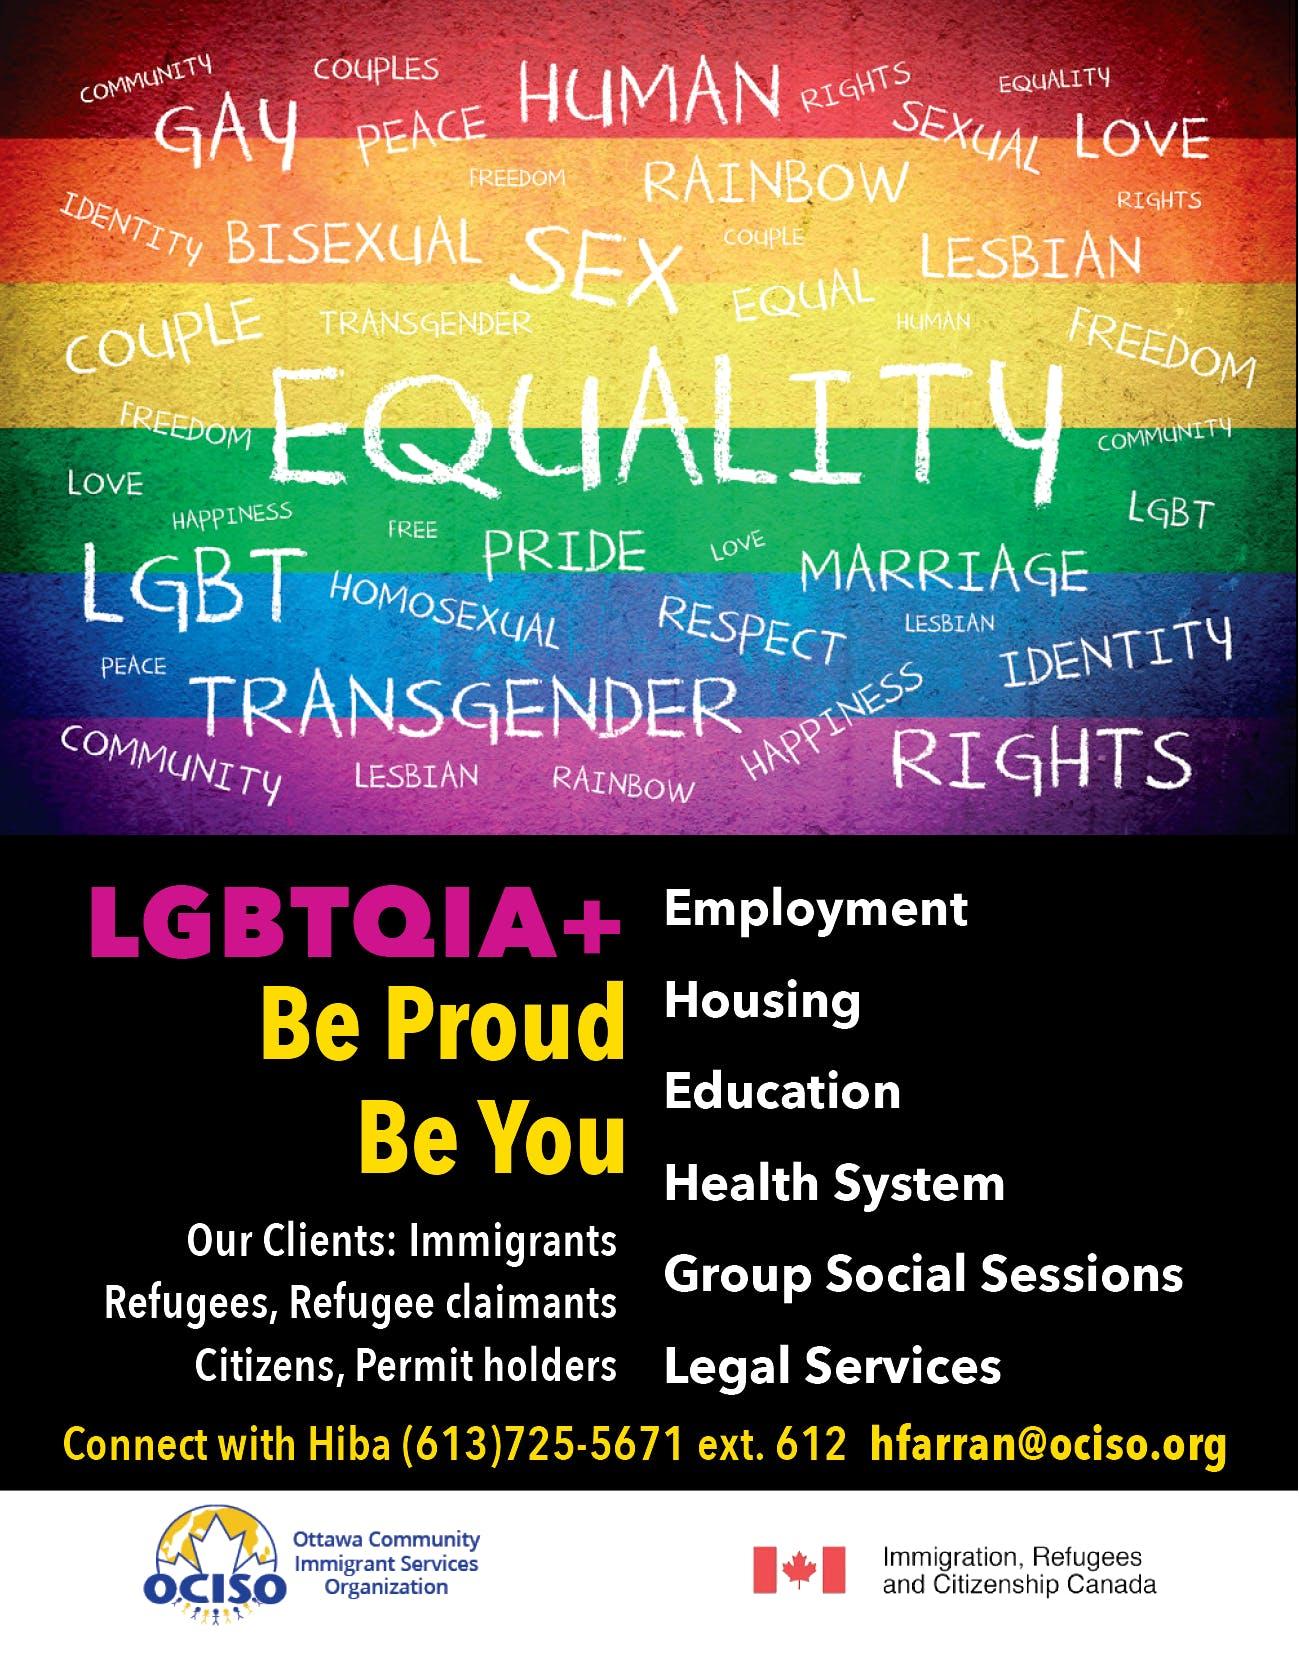 OCISO: Sharing LGBTQ Newcomer Experiences